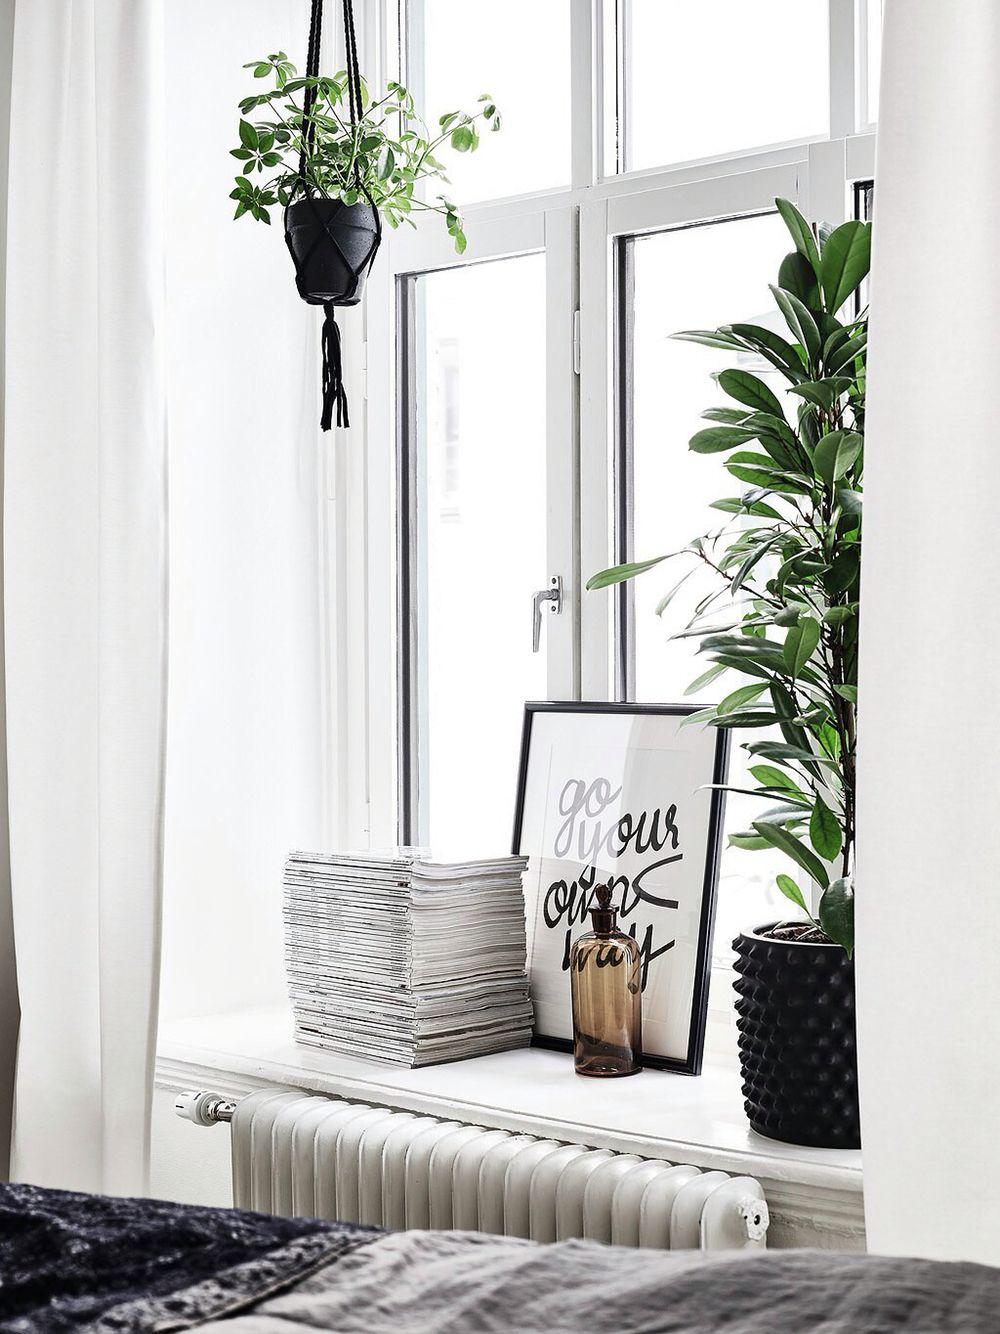 pinterest: bellaxlovee ✧☾  Indoor decor, Home decor, Window